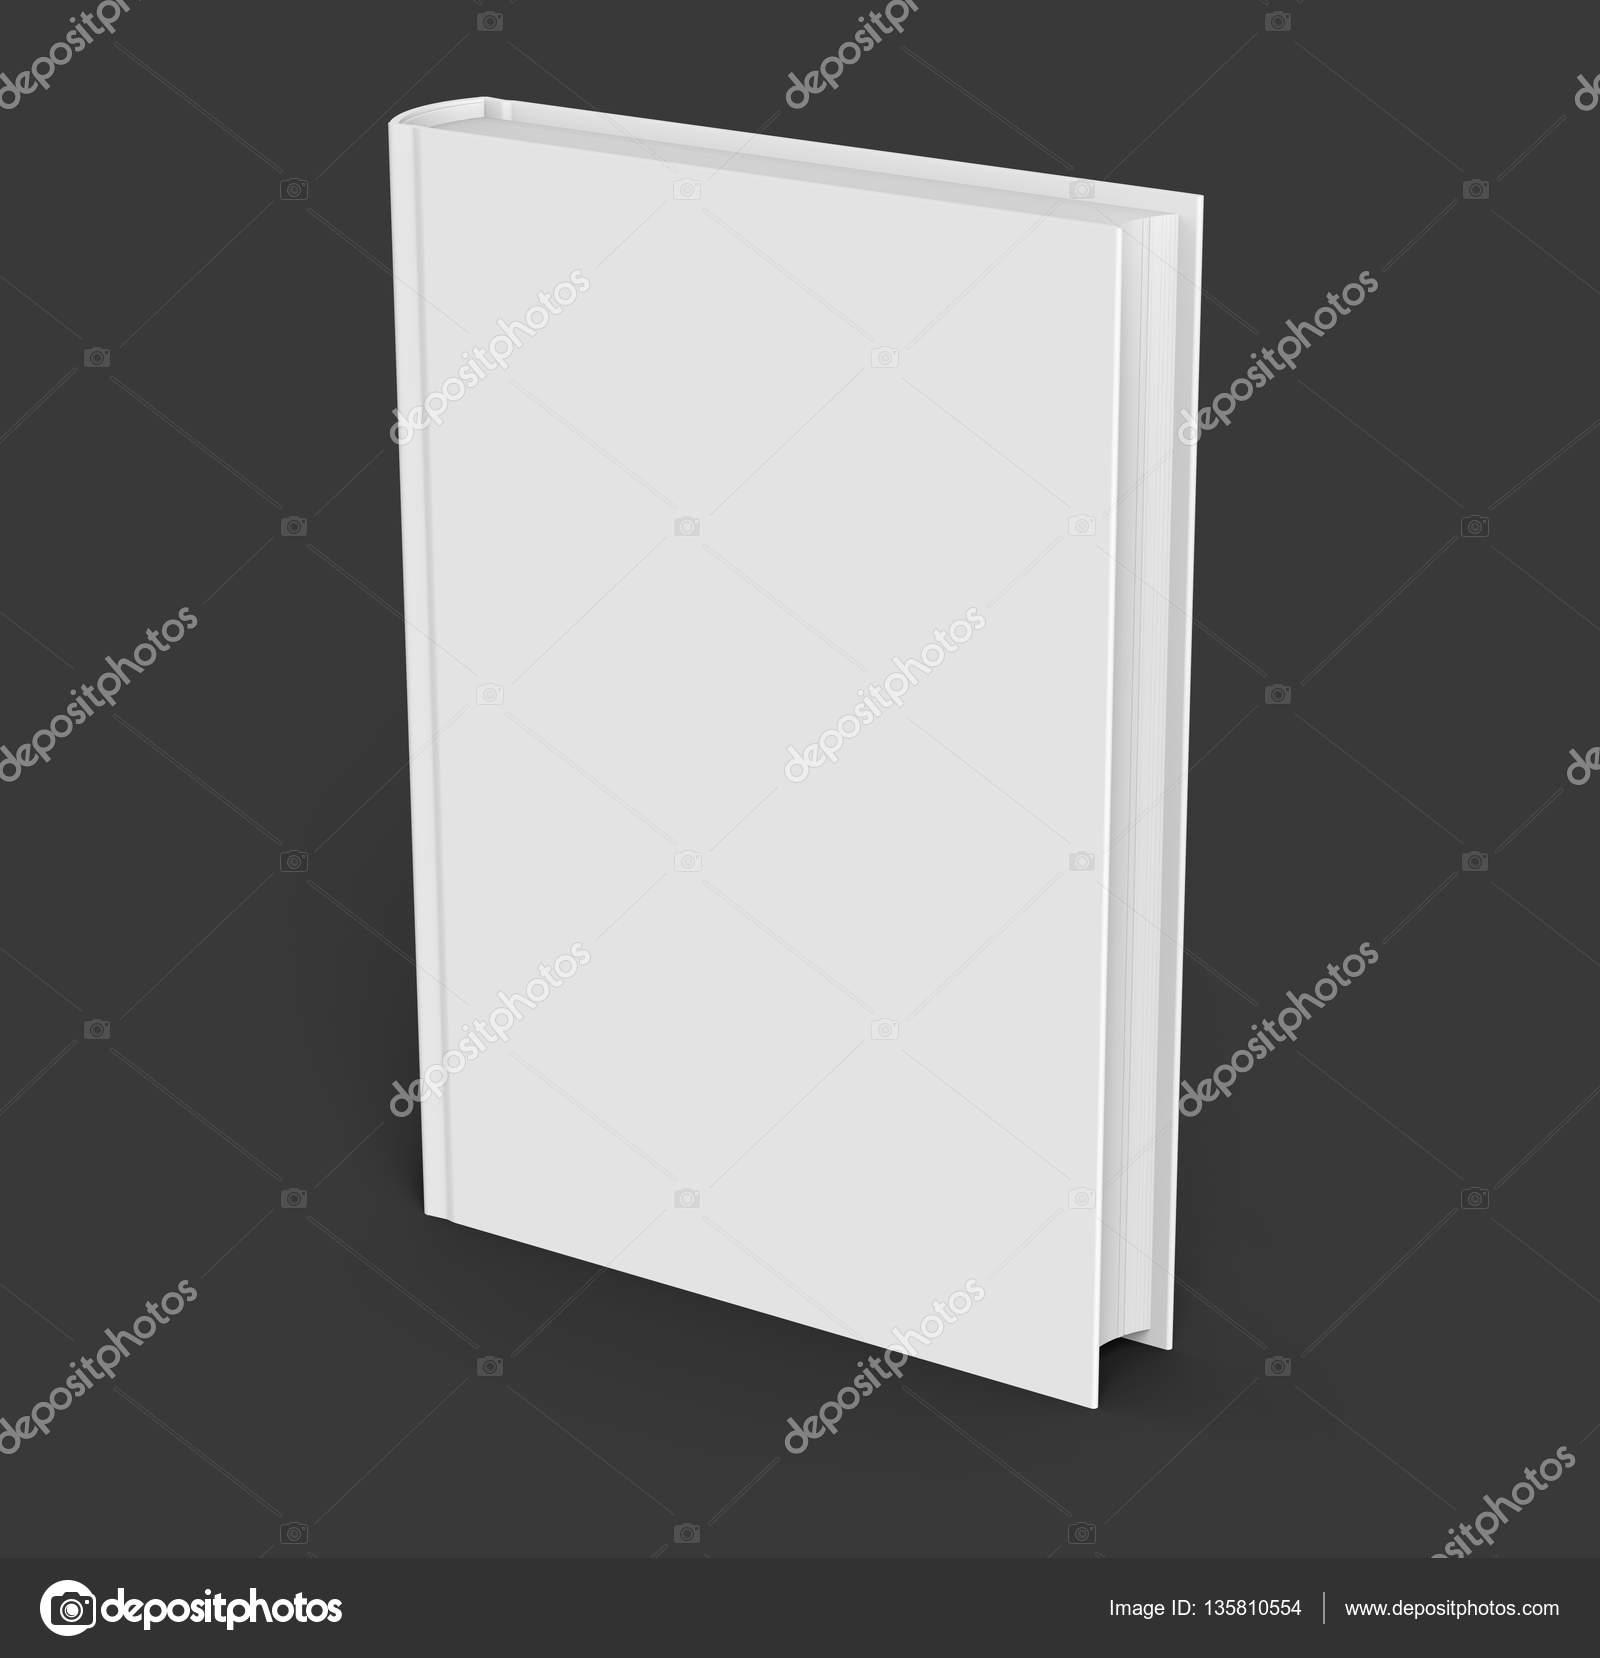 Leere Hardcover-Buch-Vorlage — Stockfoto © HstrongART #135810554